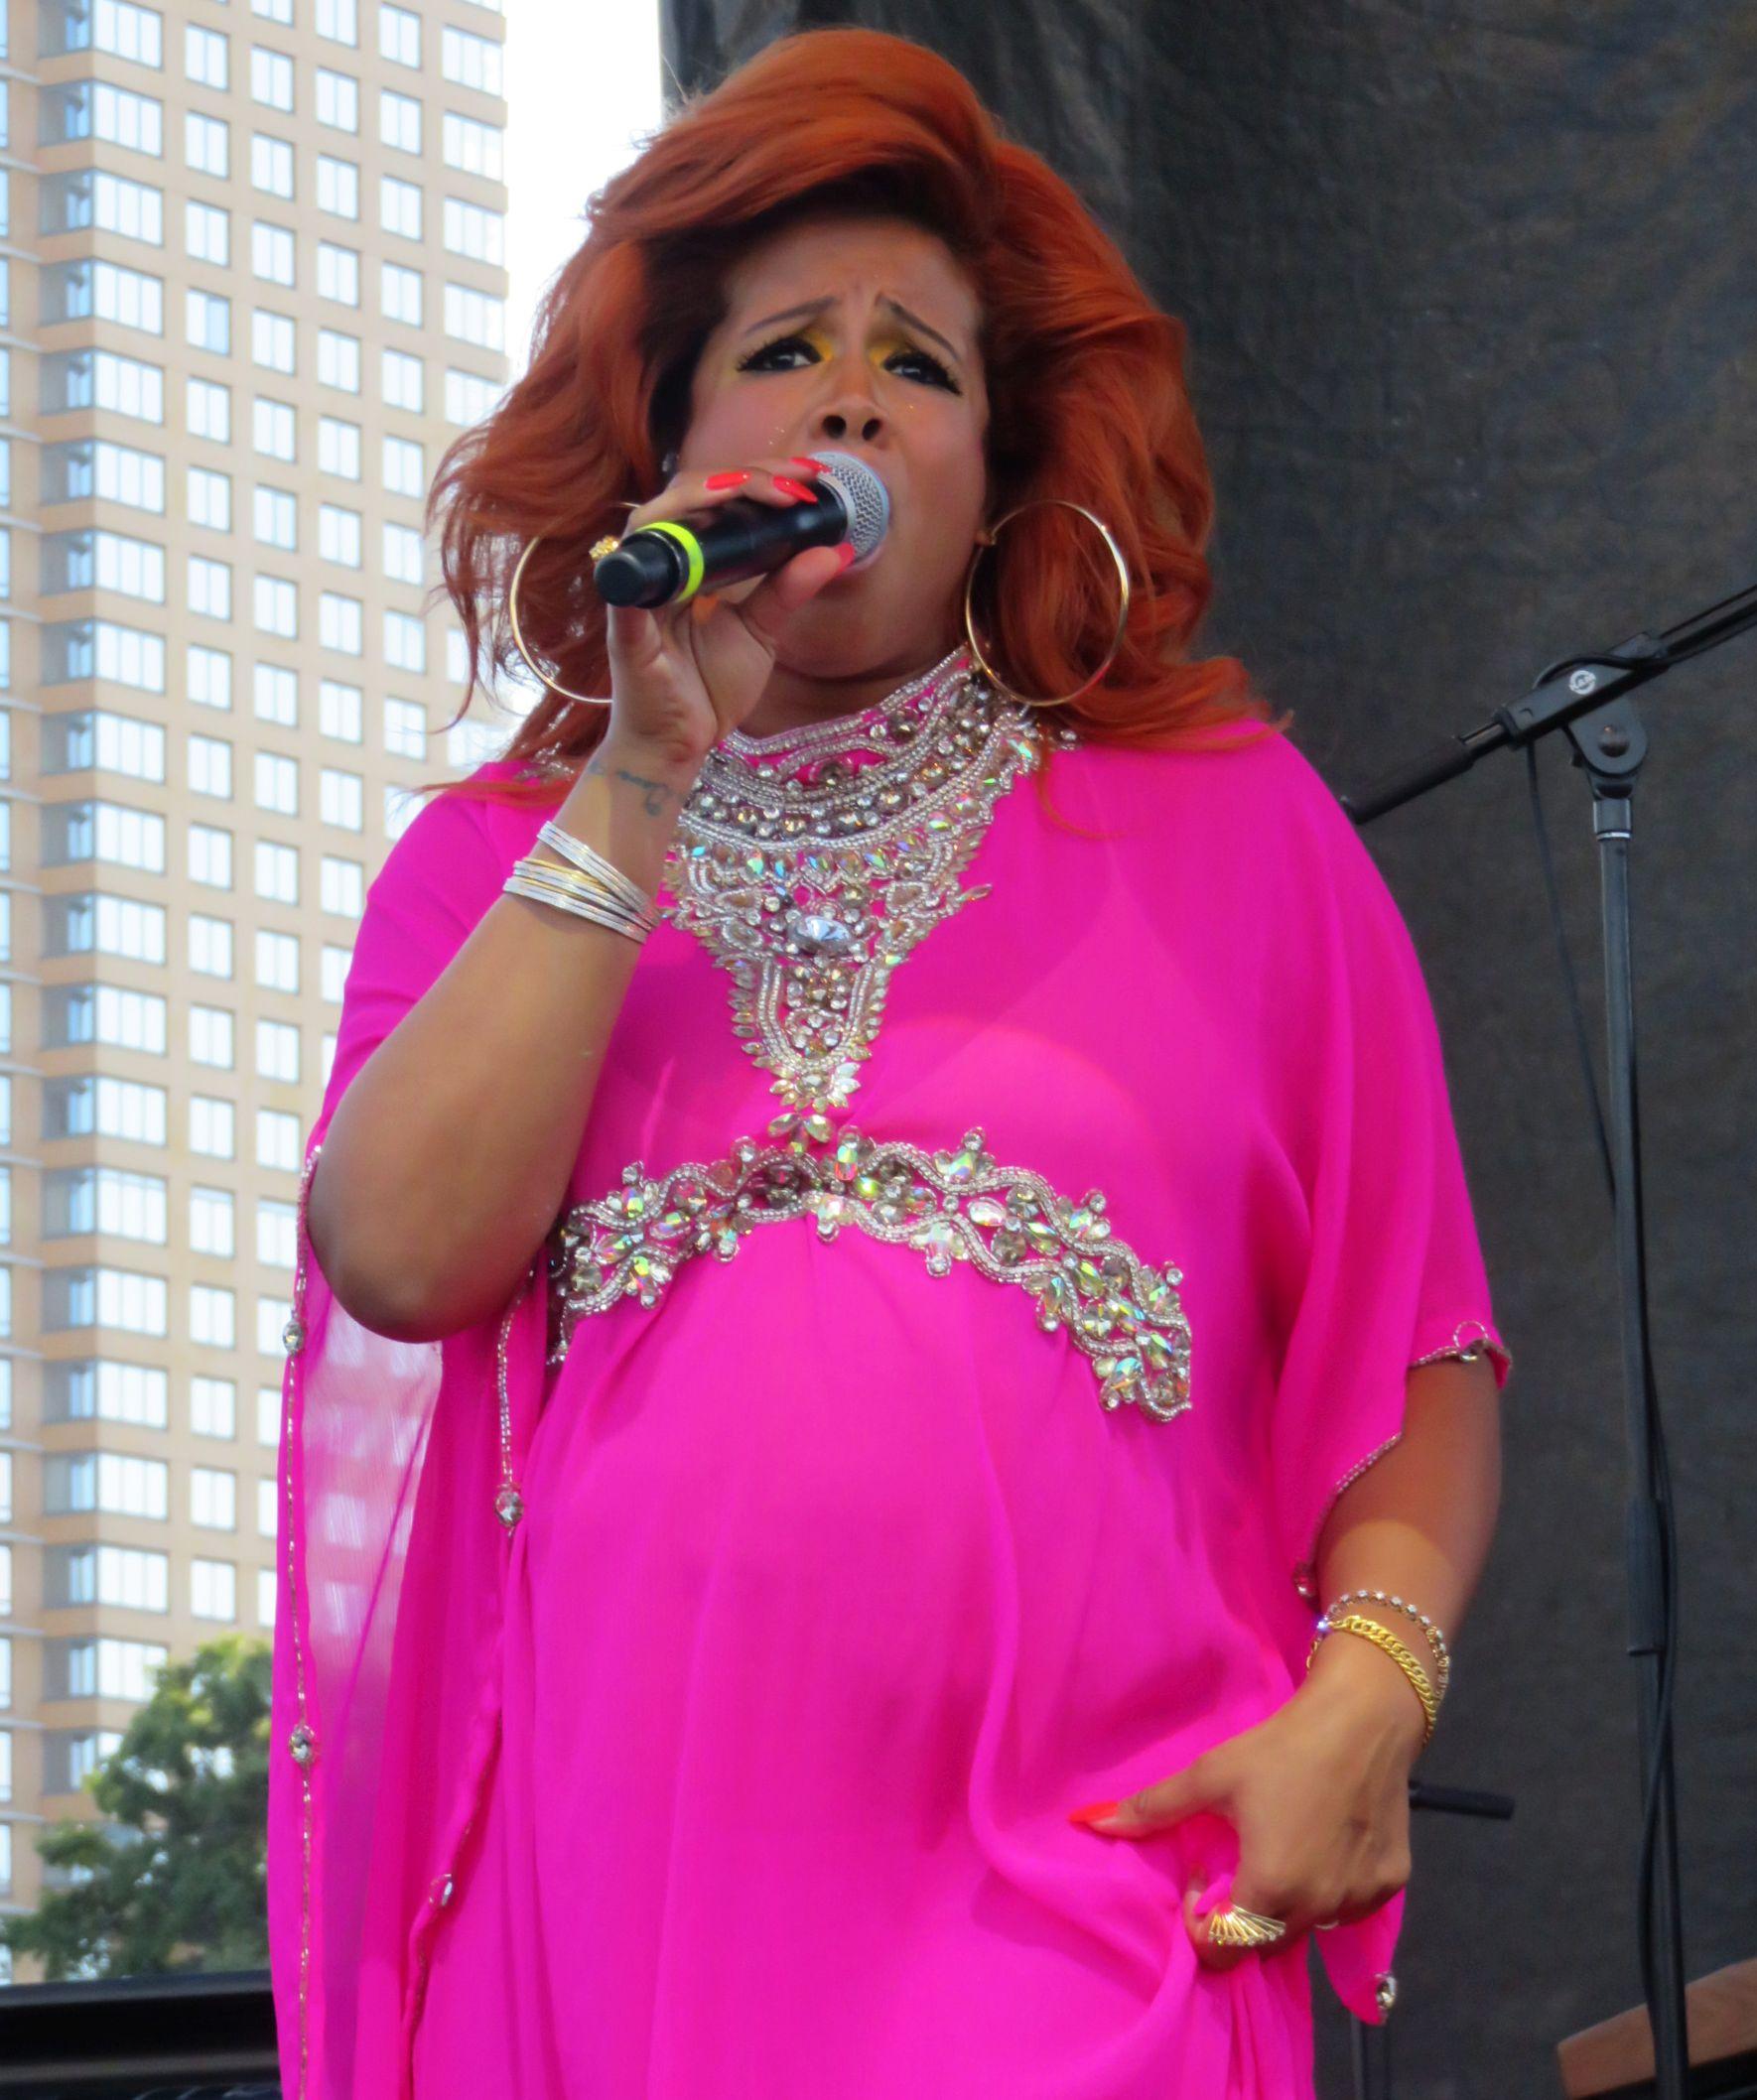 Kelis performs at Afropunk Festival